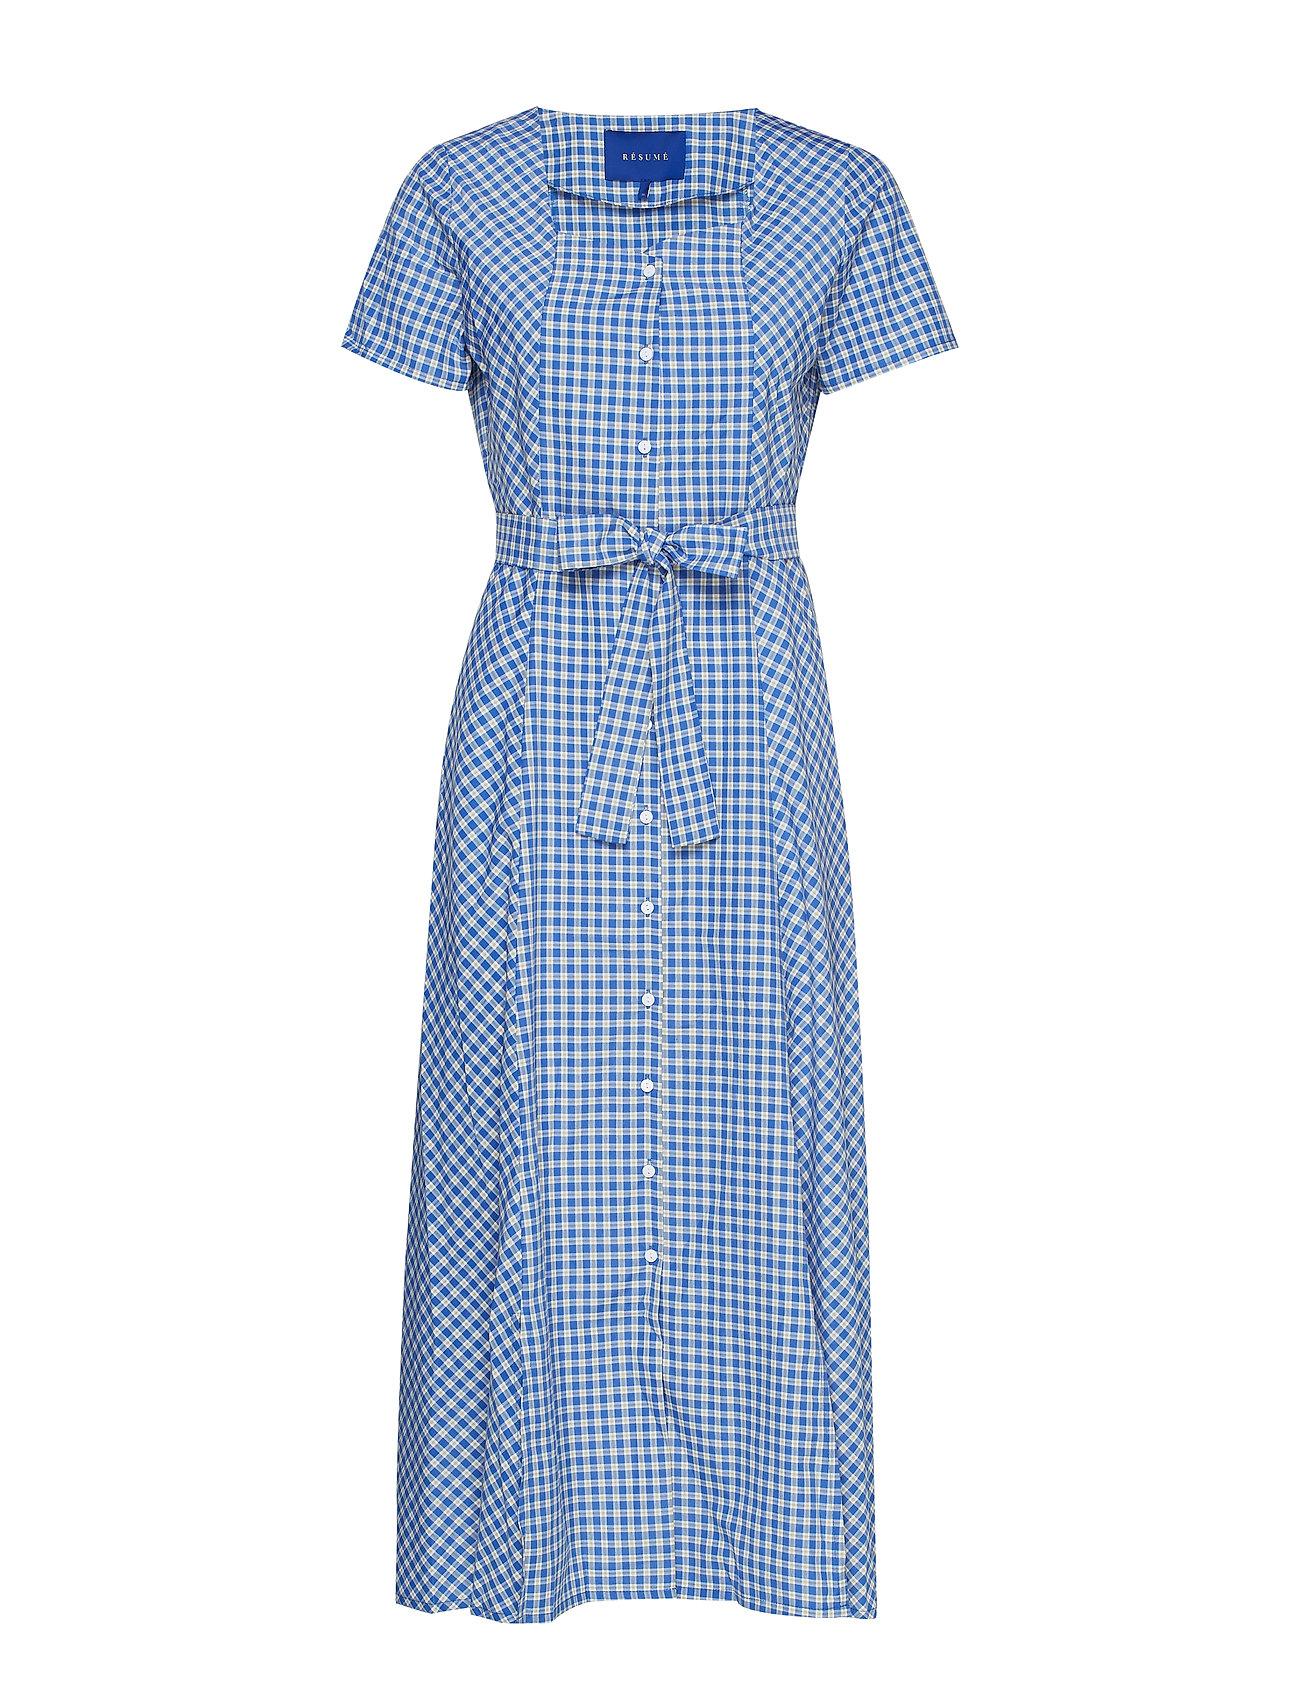 Résumé Noma dress - OCEAN BLUE